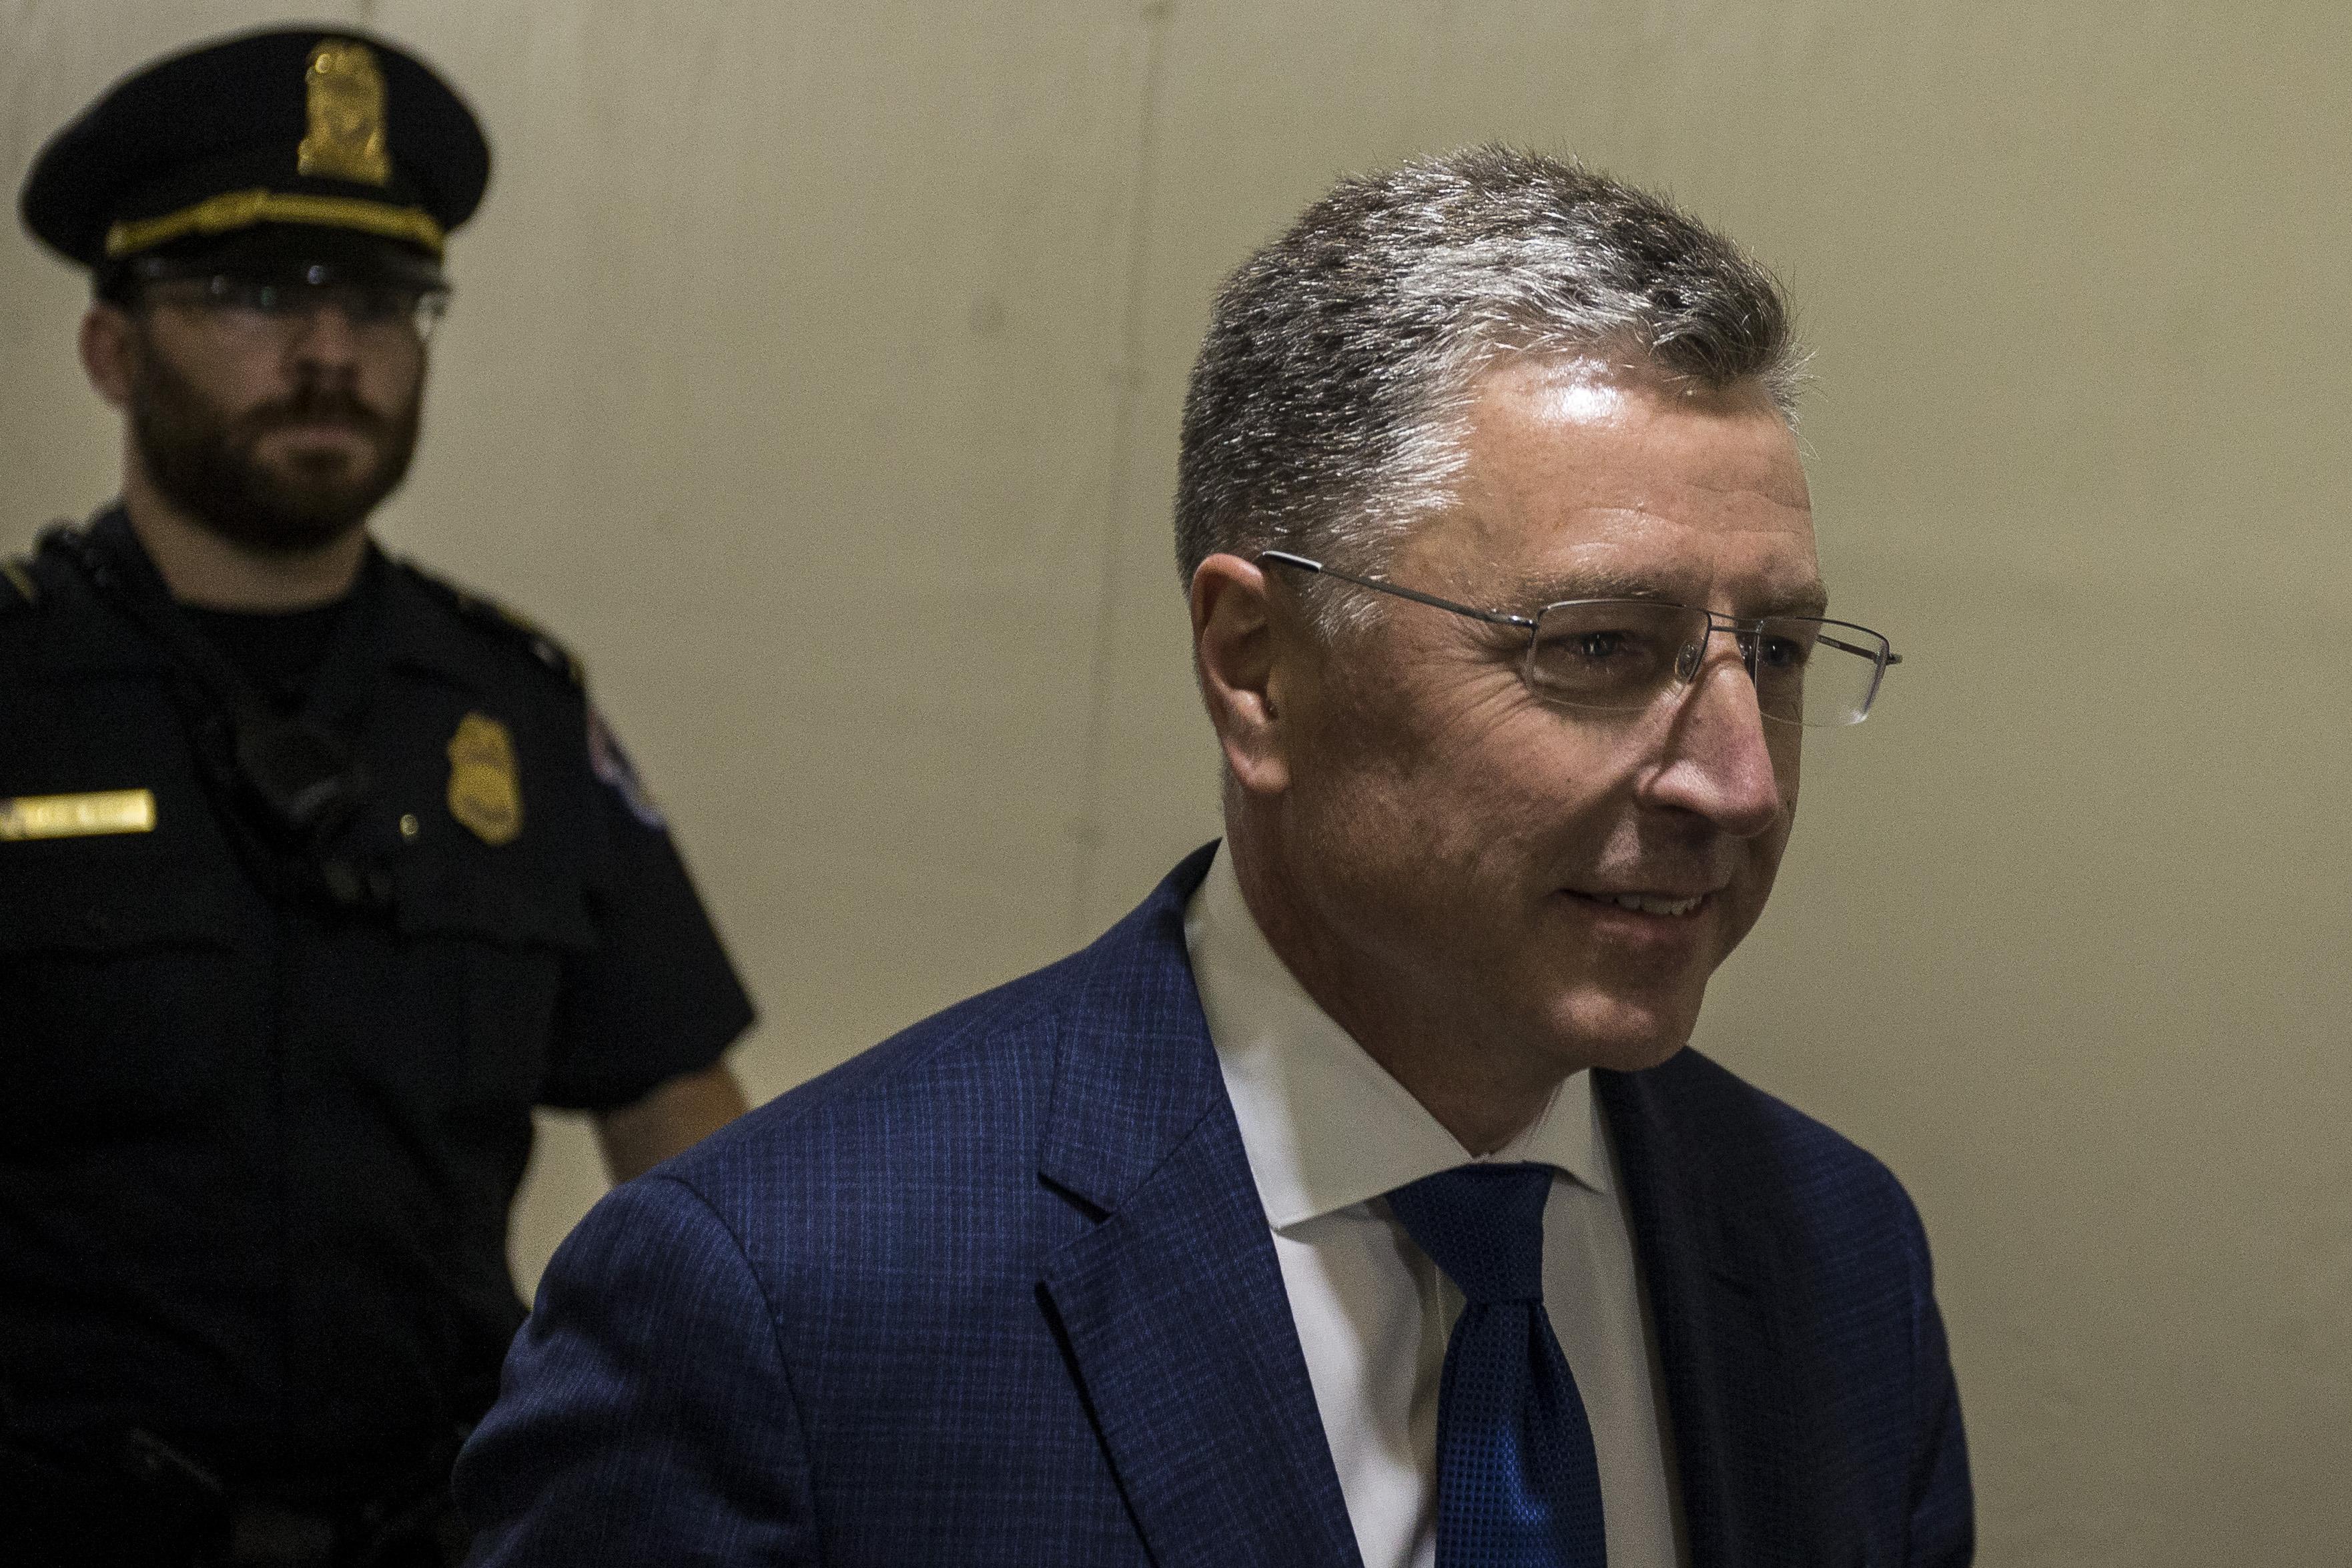 Former special envoy for Ukraine Kurt Volker